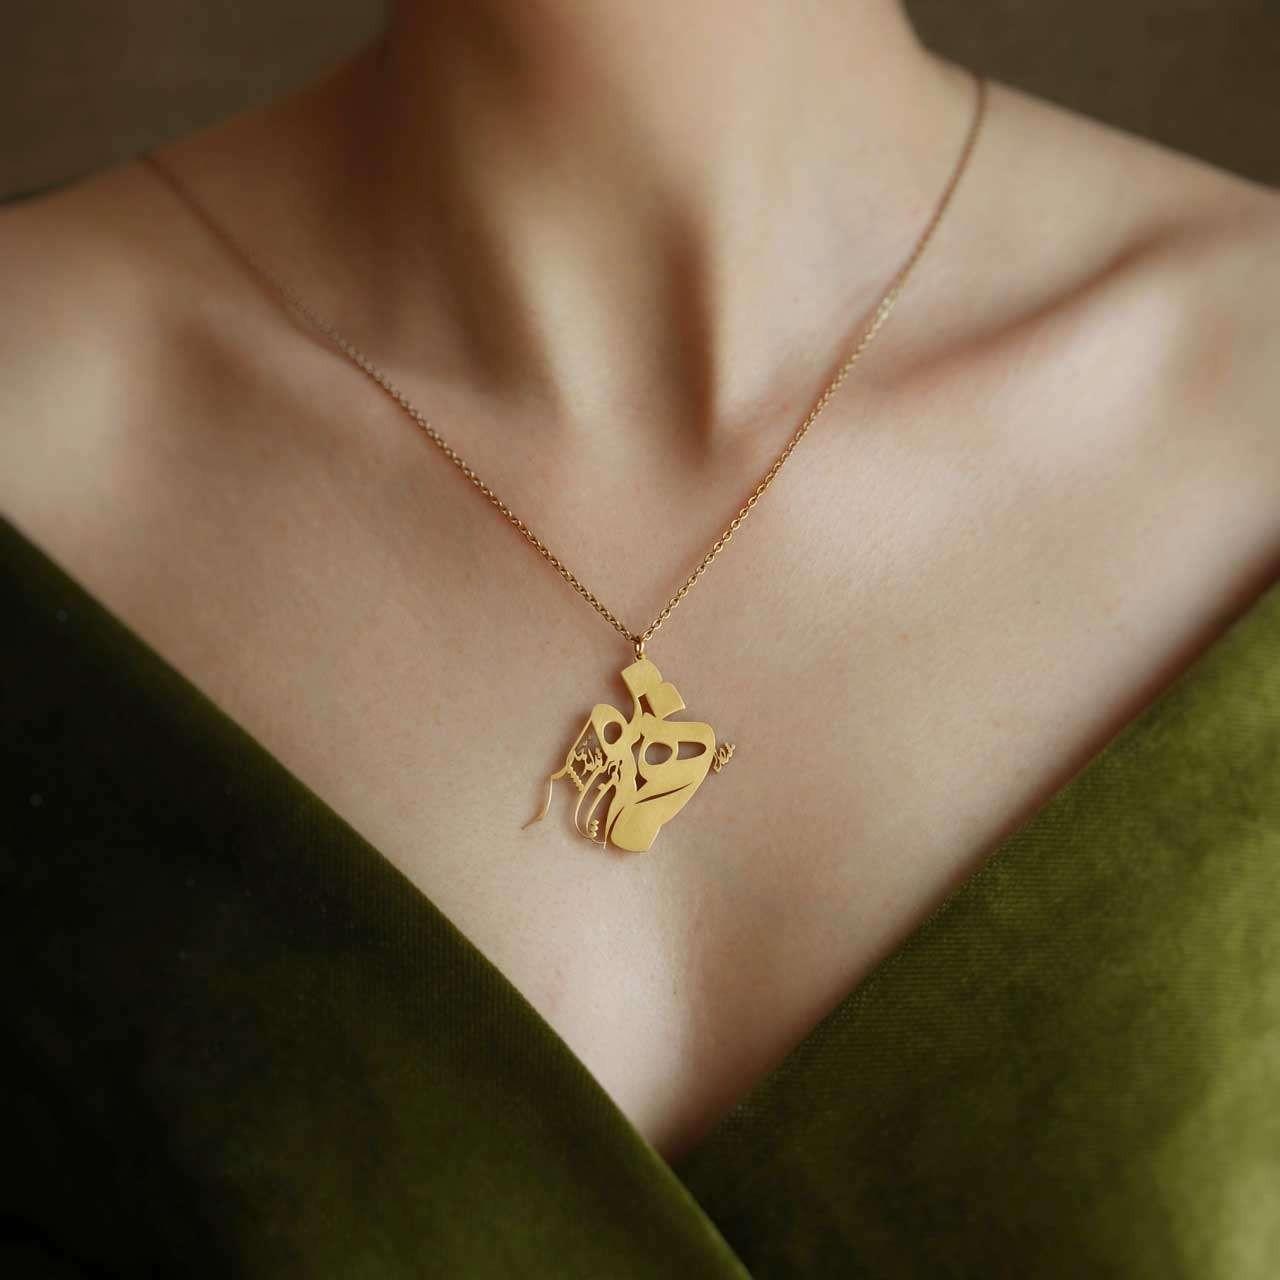 گردنبند طلا - طرح یار همنفس